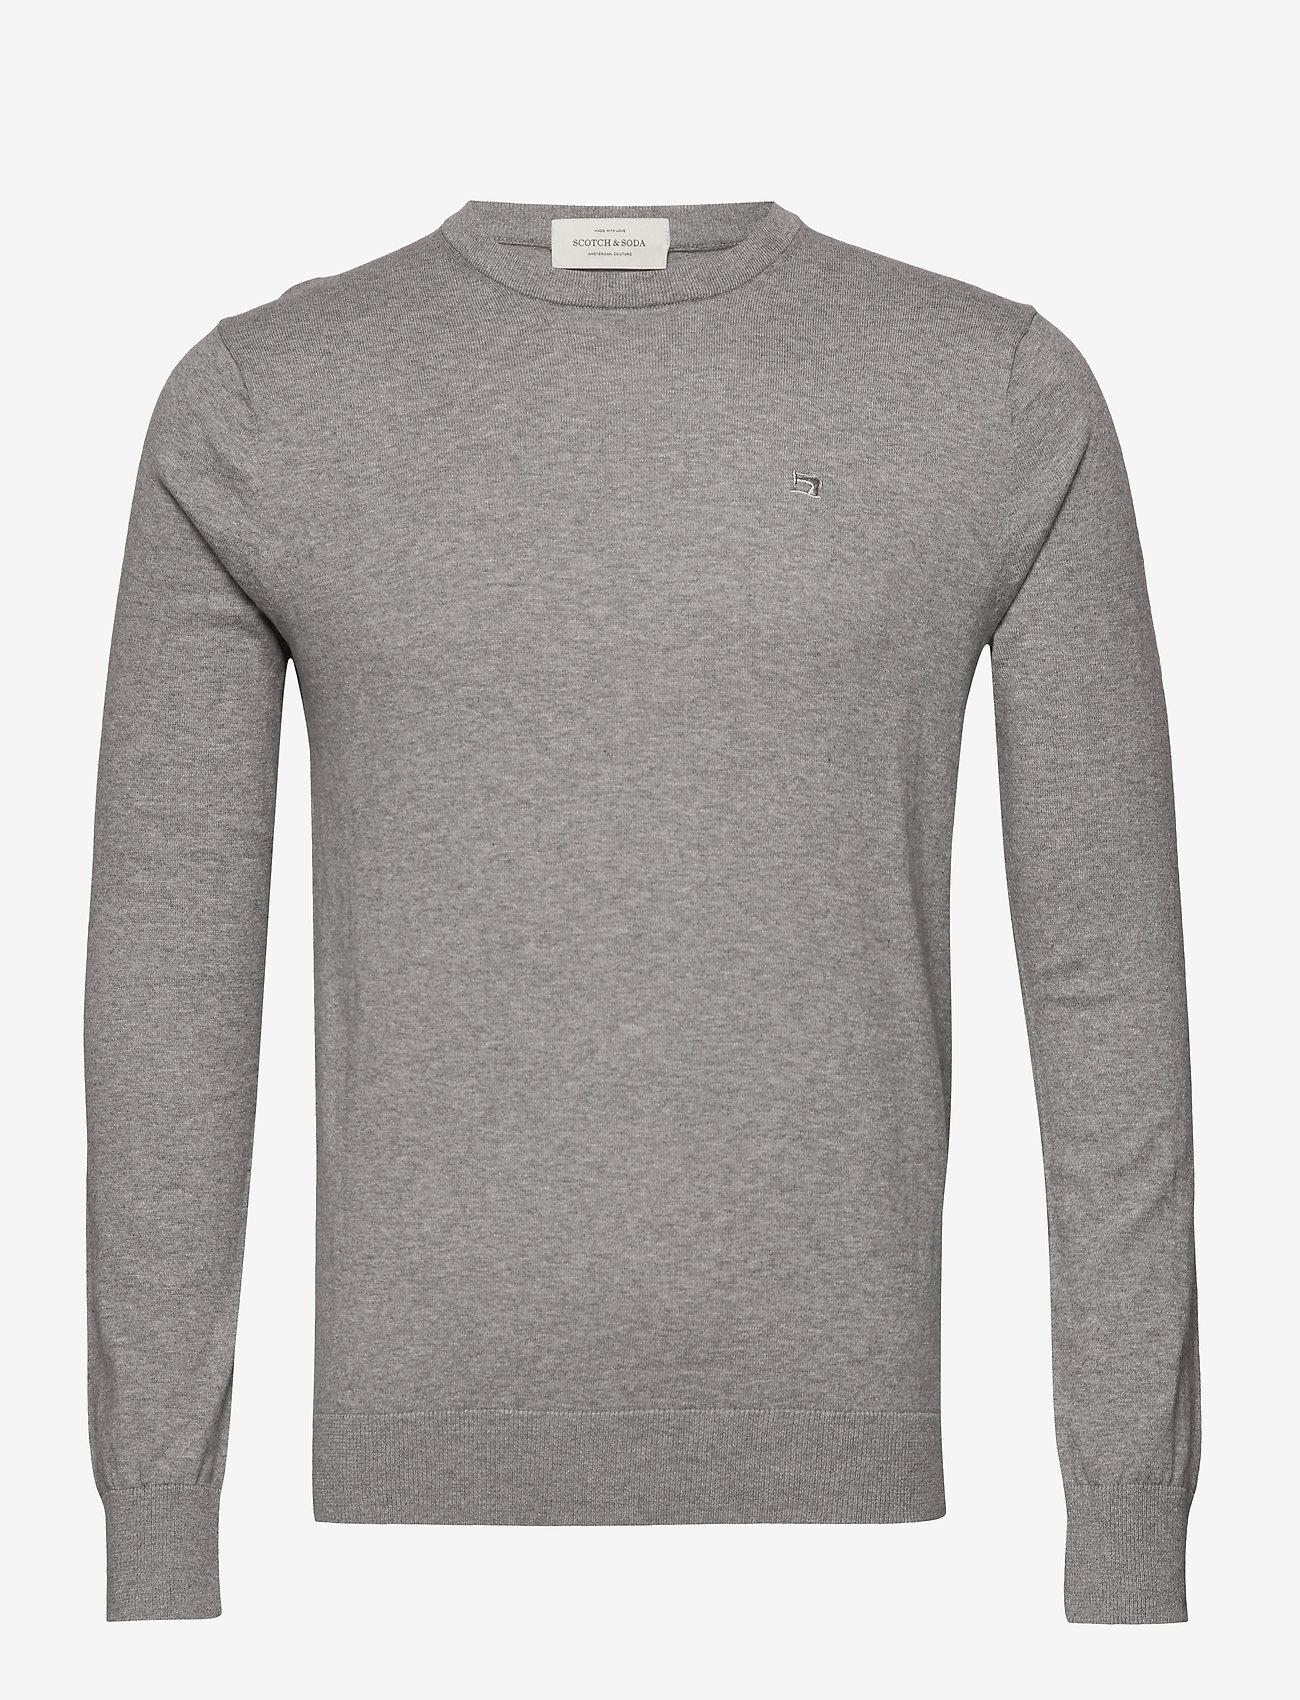 Scotch & Soda - NOS Cotton cashmere crewneck knit - pulls col rond - grey melange - 0